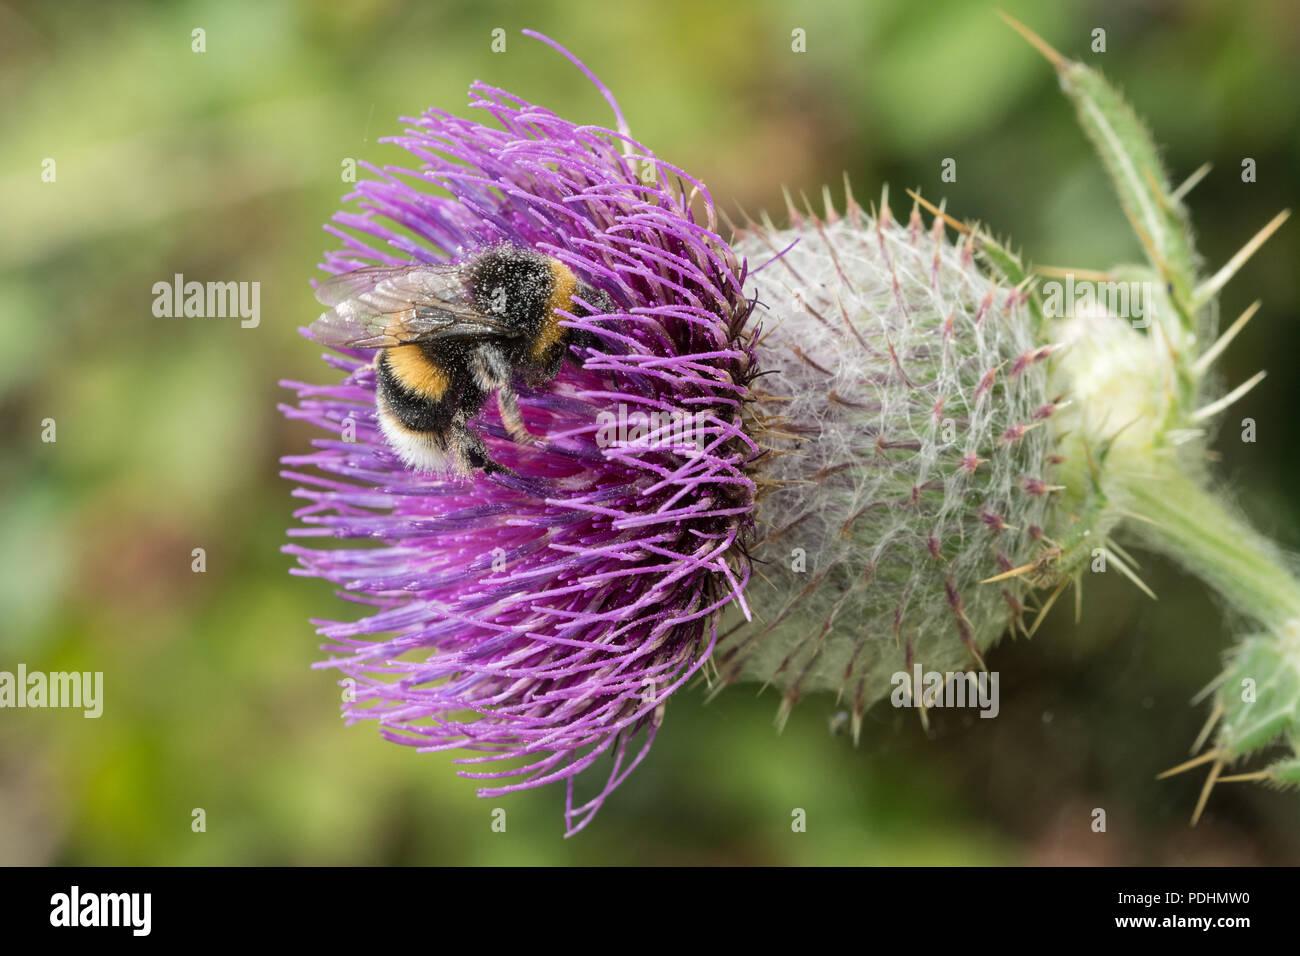 bombus-lucorum-the-white-tailed-bumblebee-nectaring-on-a-purple-thistle-PDHMW0.jpg